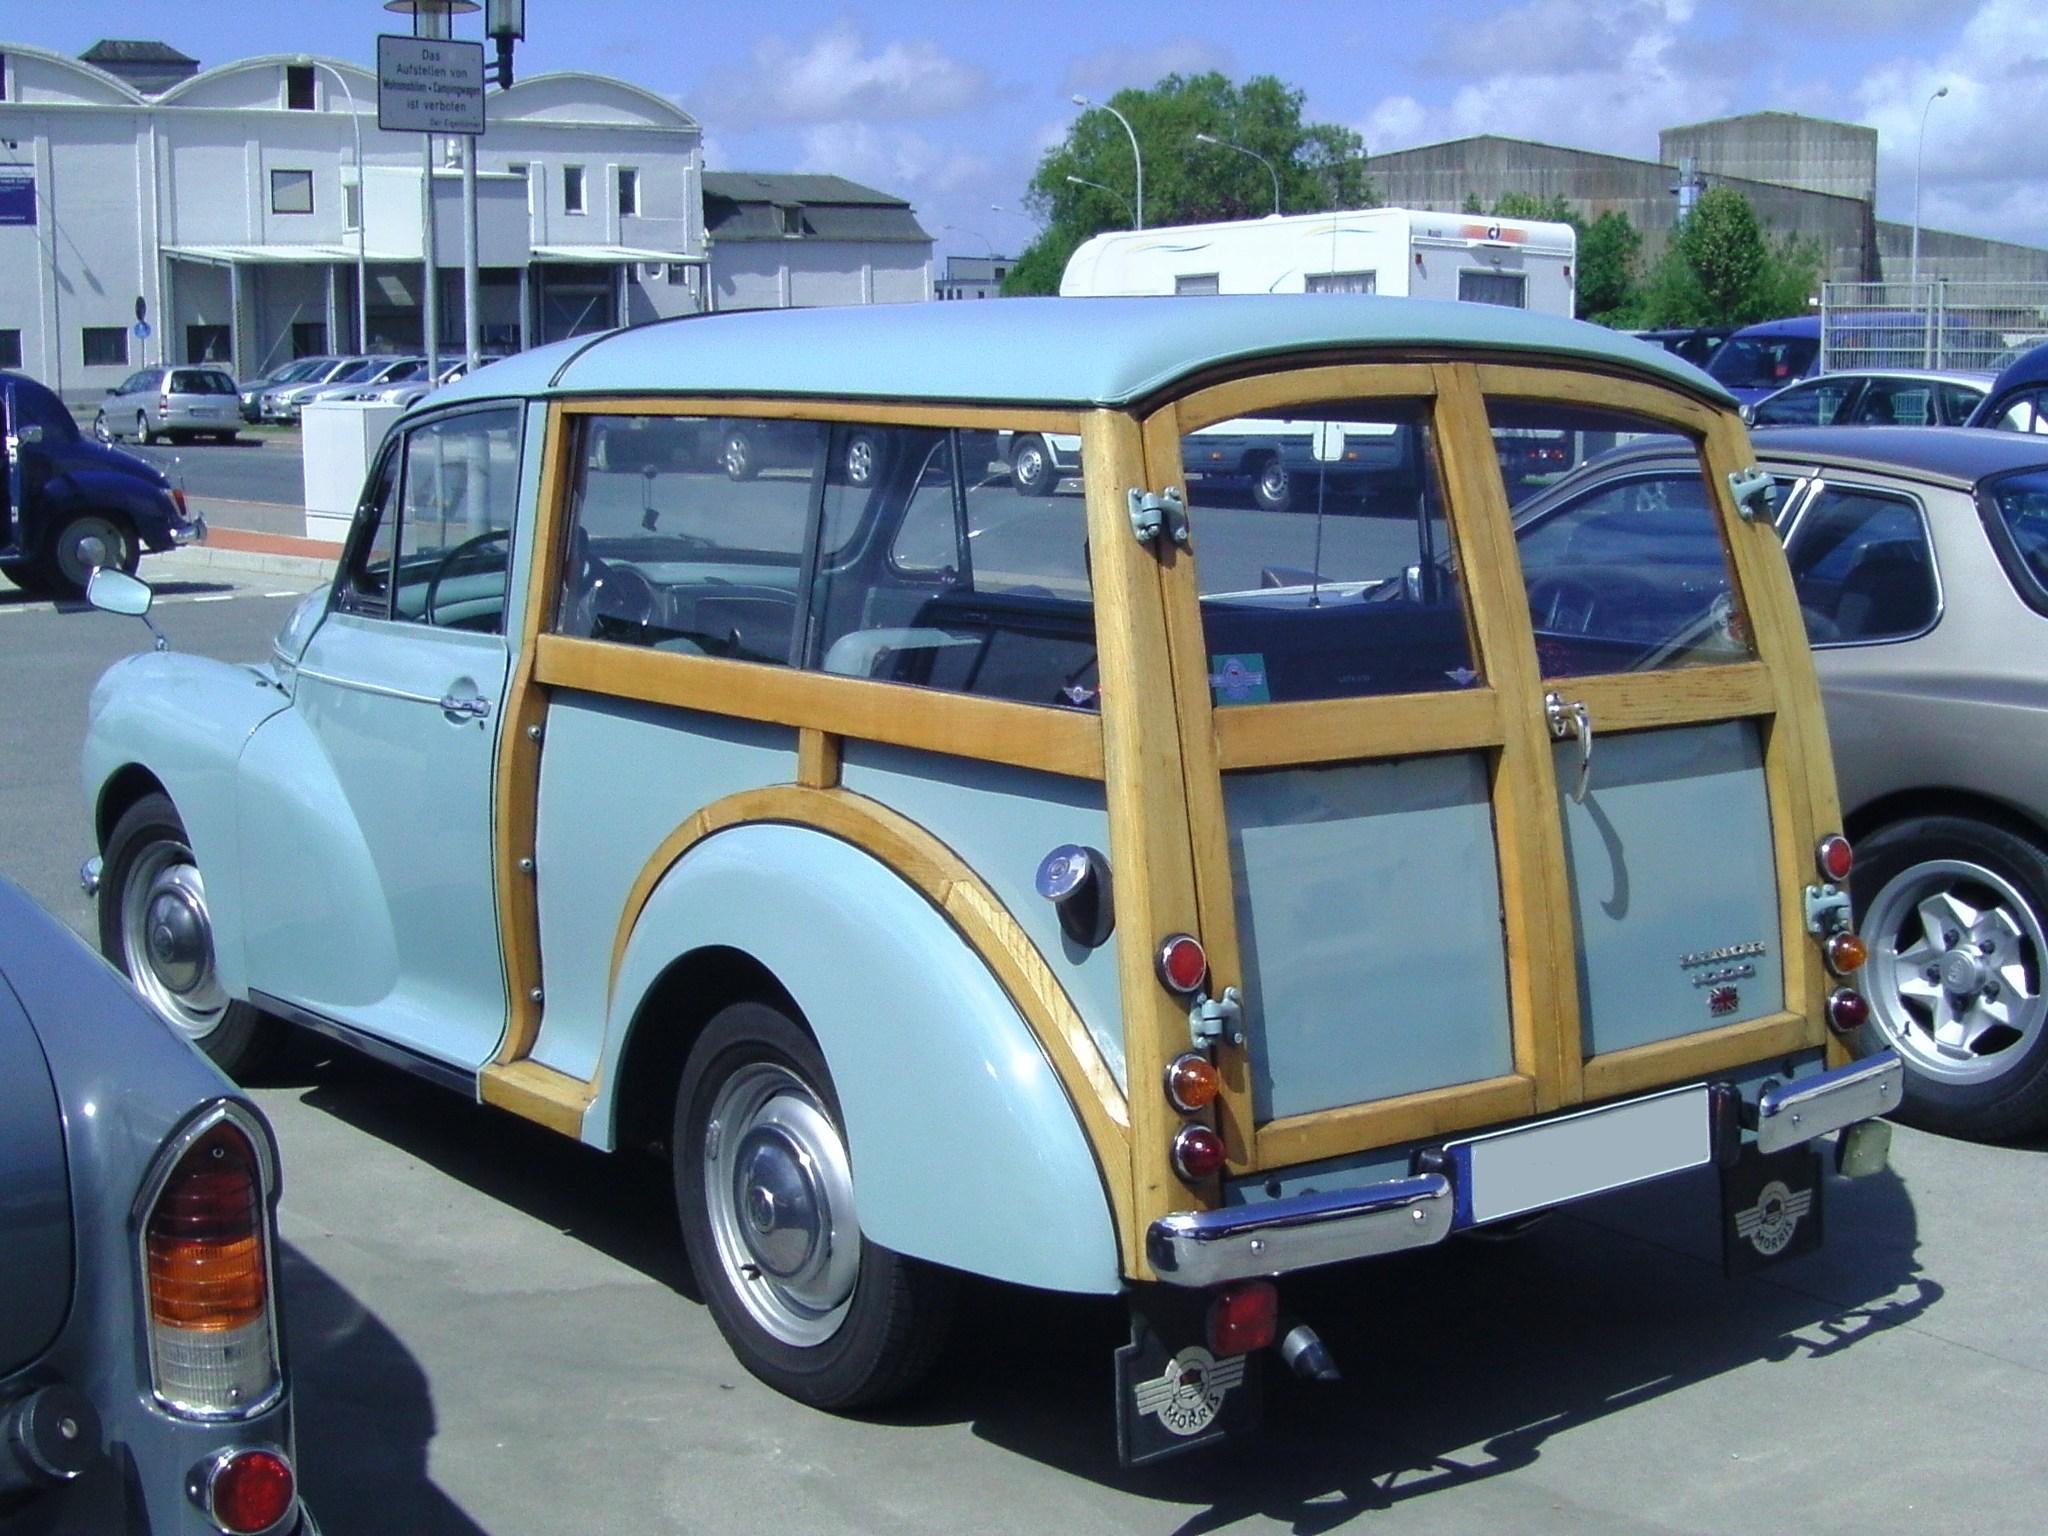 Cars For Under 1000 >> File:Morris Minor 1000 Estate.jpg - Wikimedia Commons